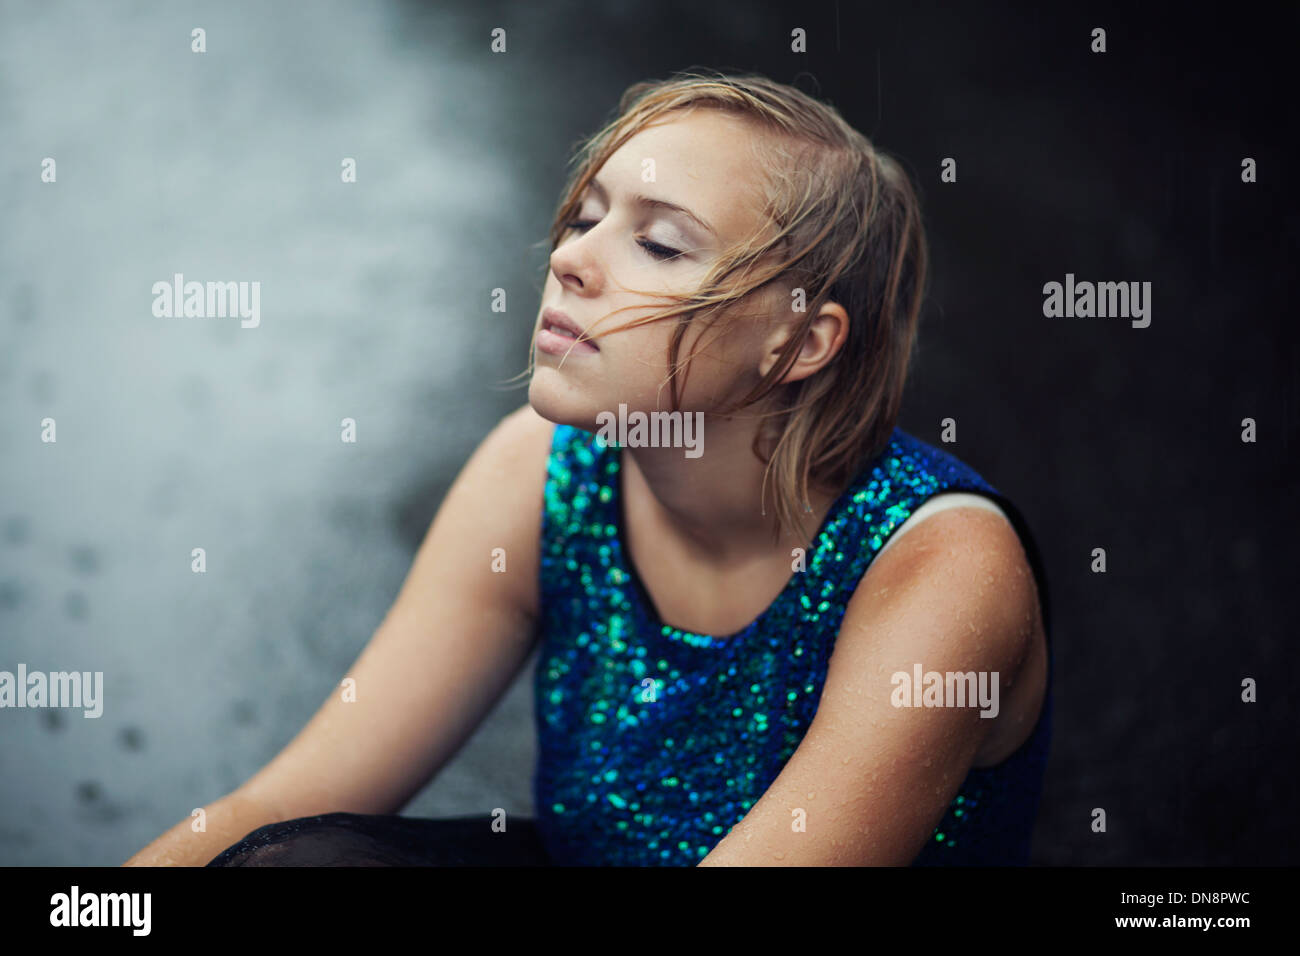 Mujer joven sentada en la lluvia en la carretera Imagen De Stock